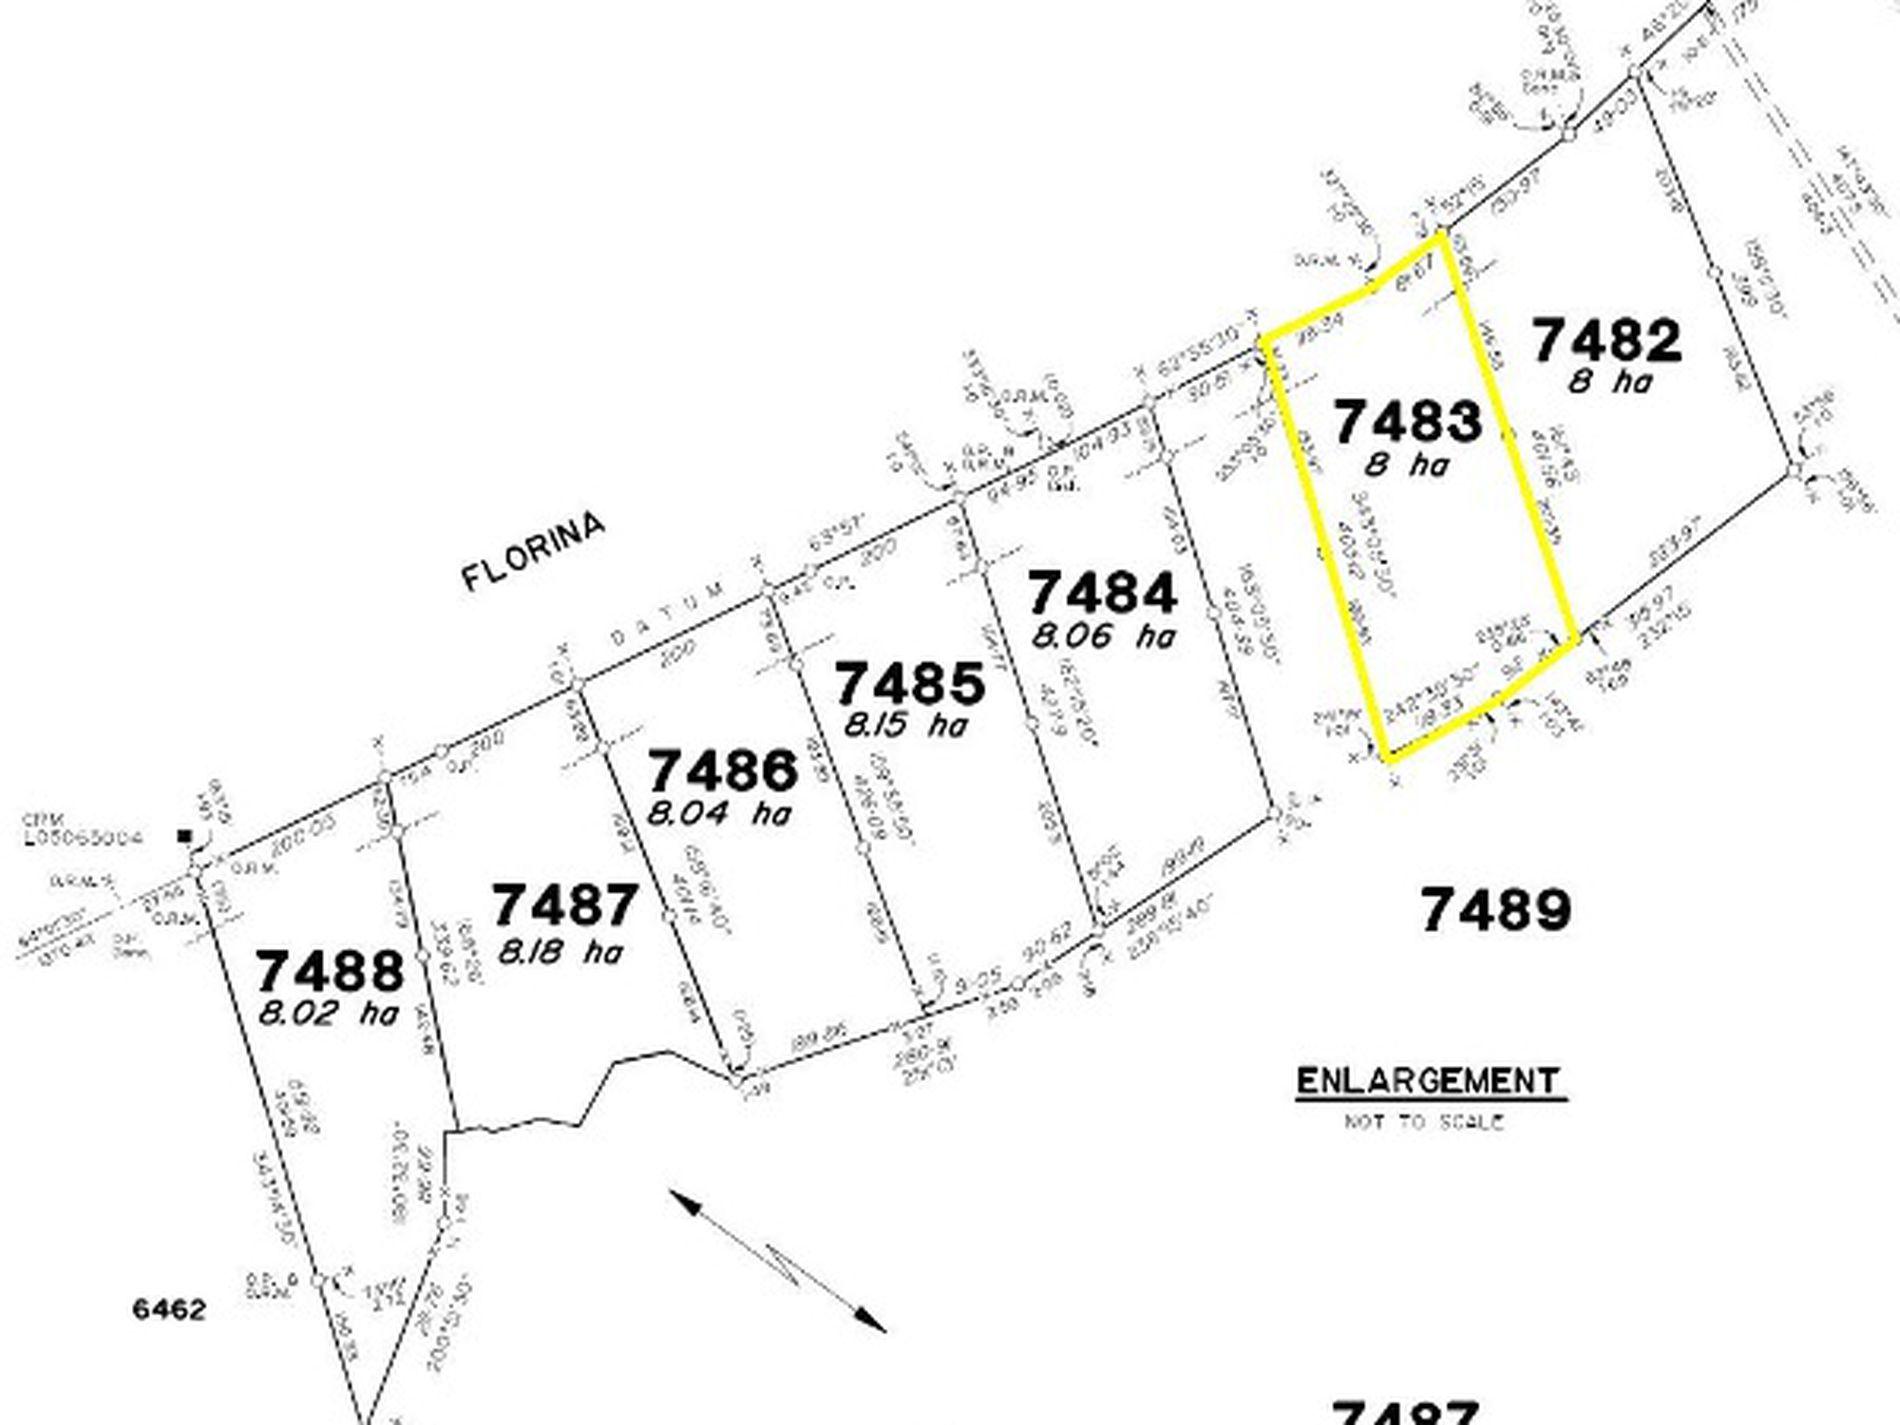 1737 Florina Road, Katherine